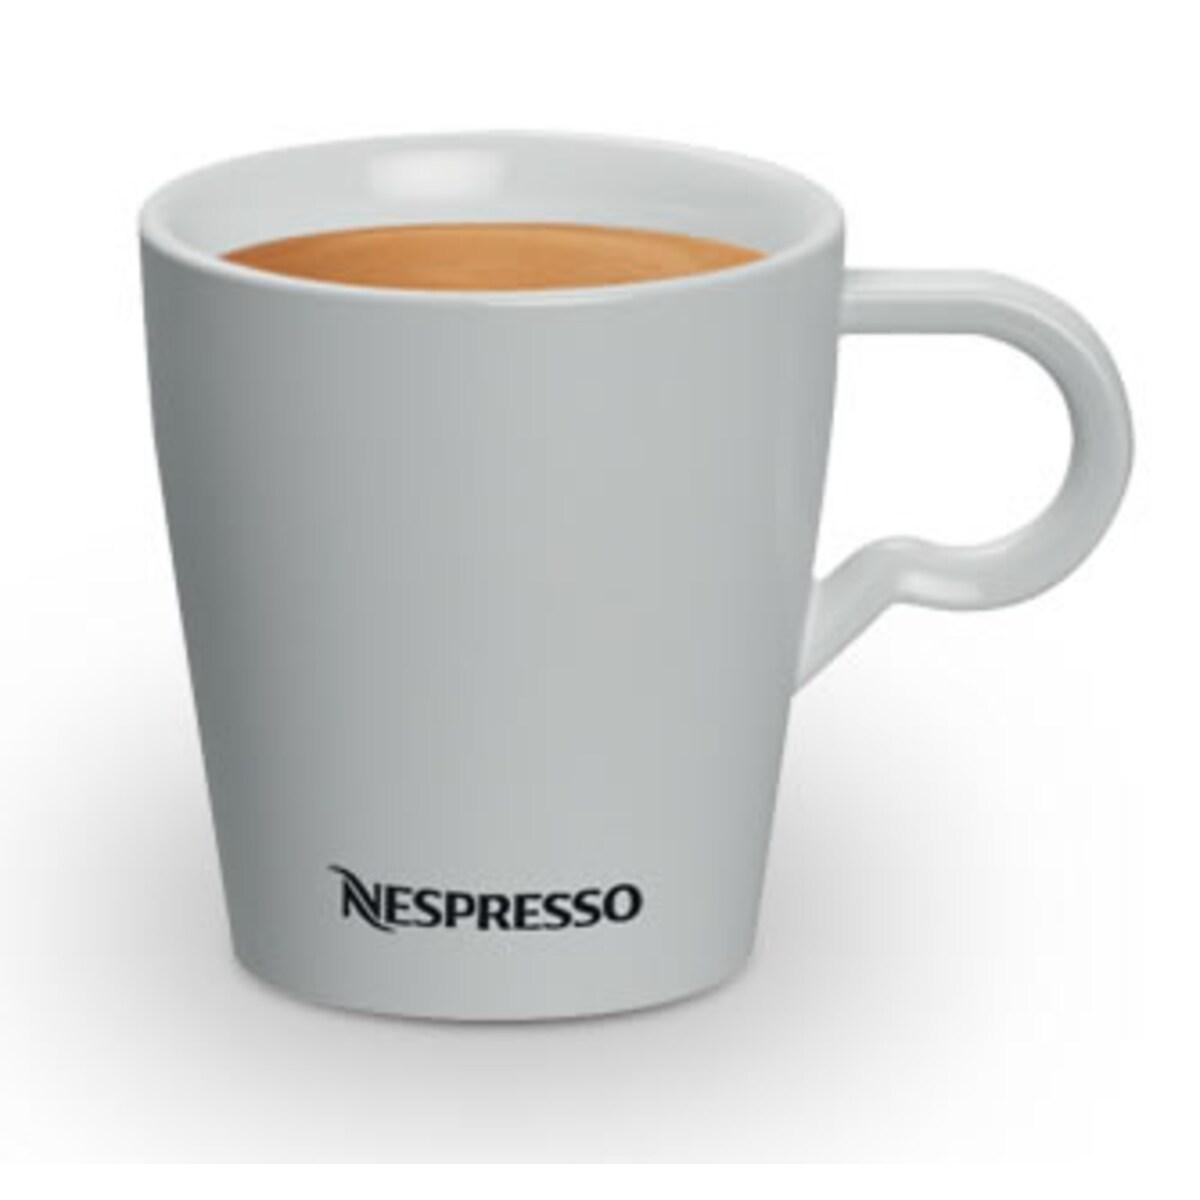 Nespresso Professional Espresso Cup Порцеланова чаша 1бр